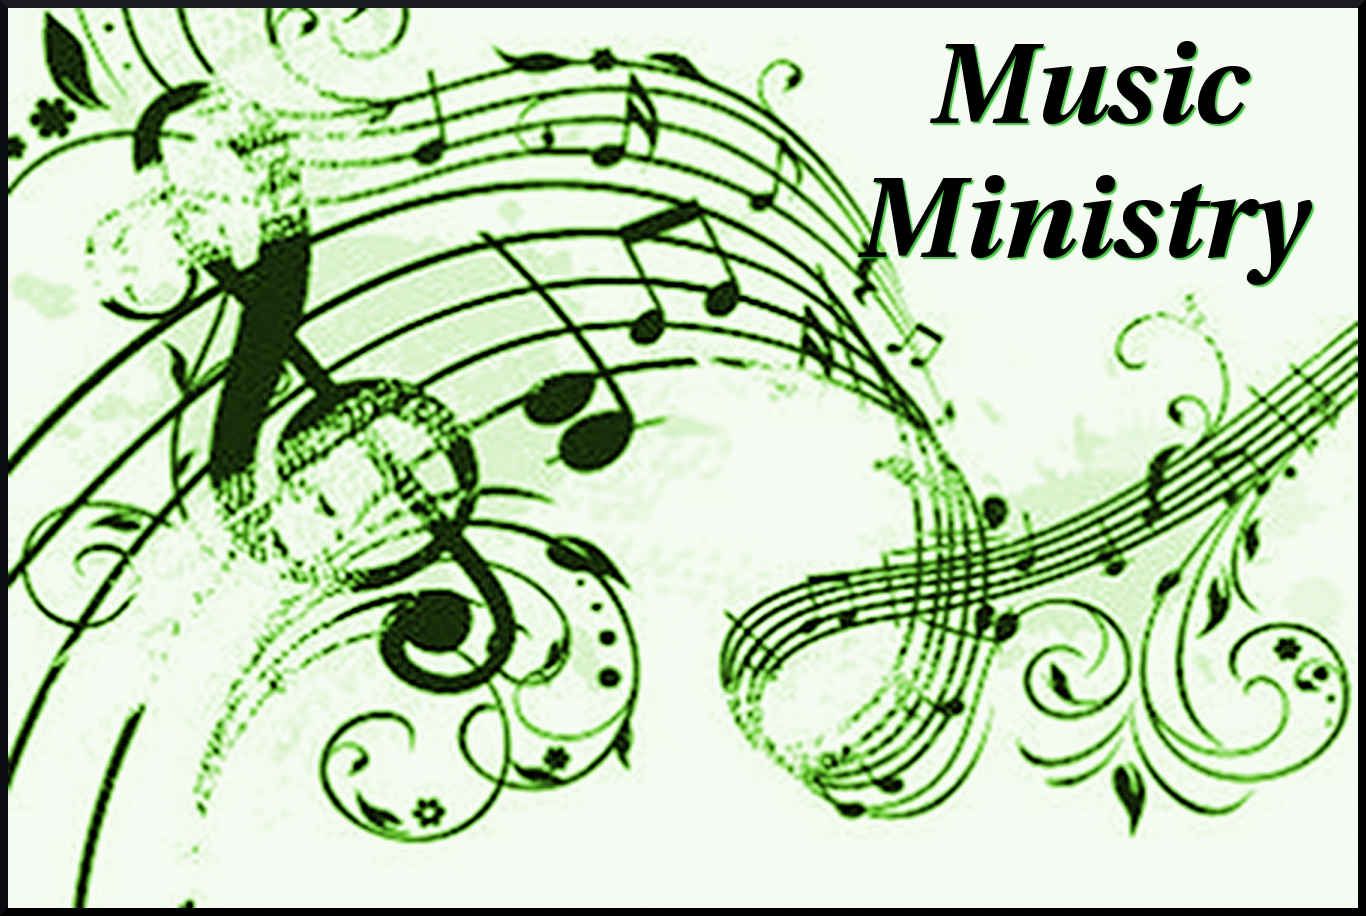 Music Ministry Logo